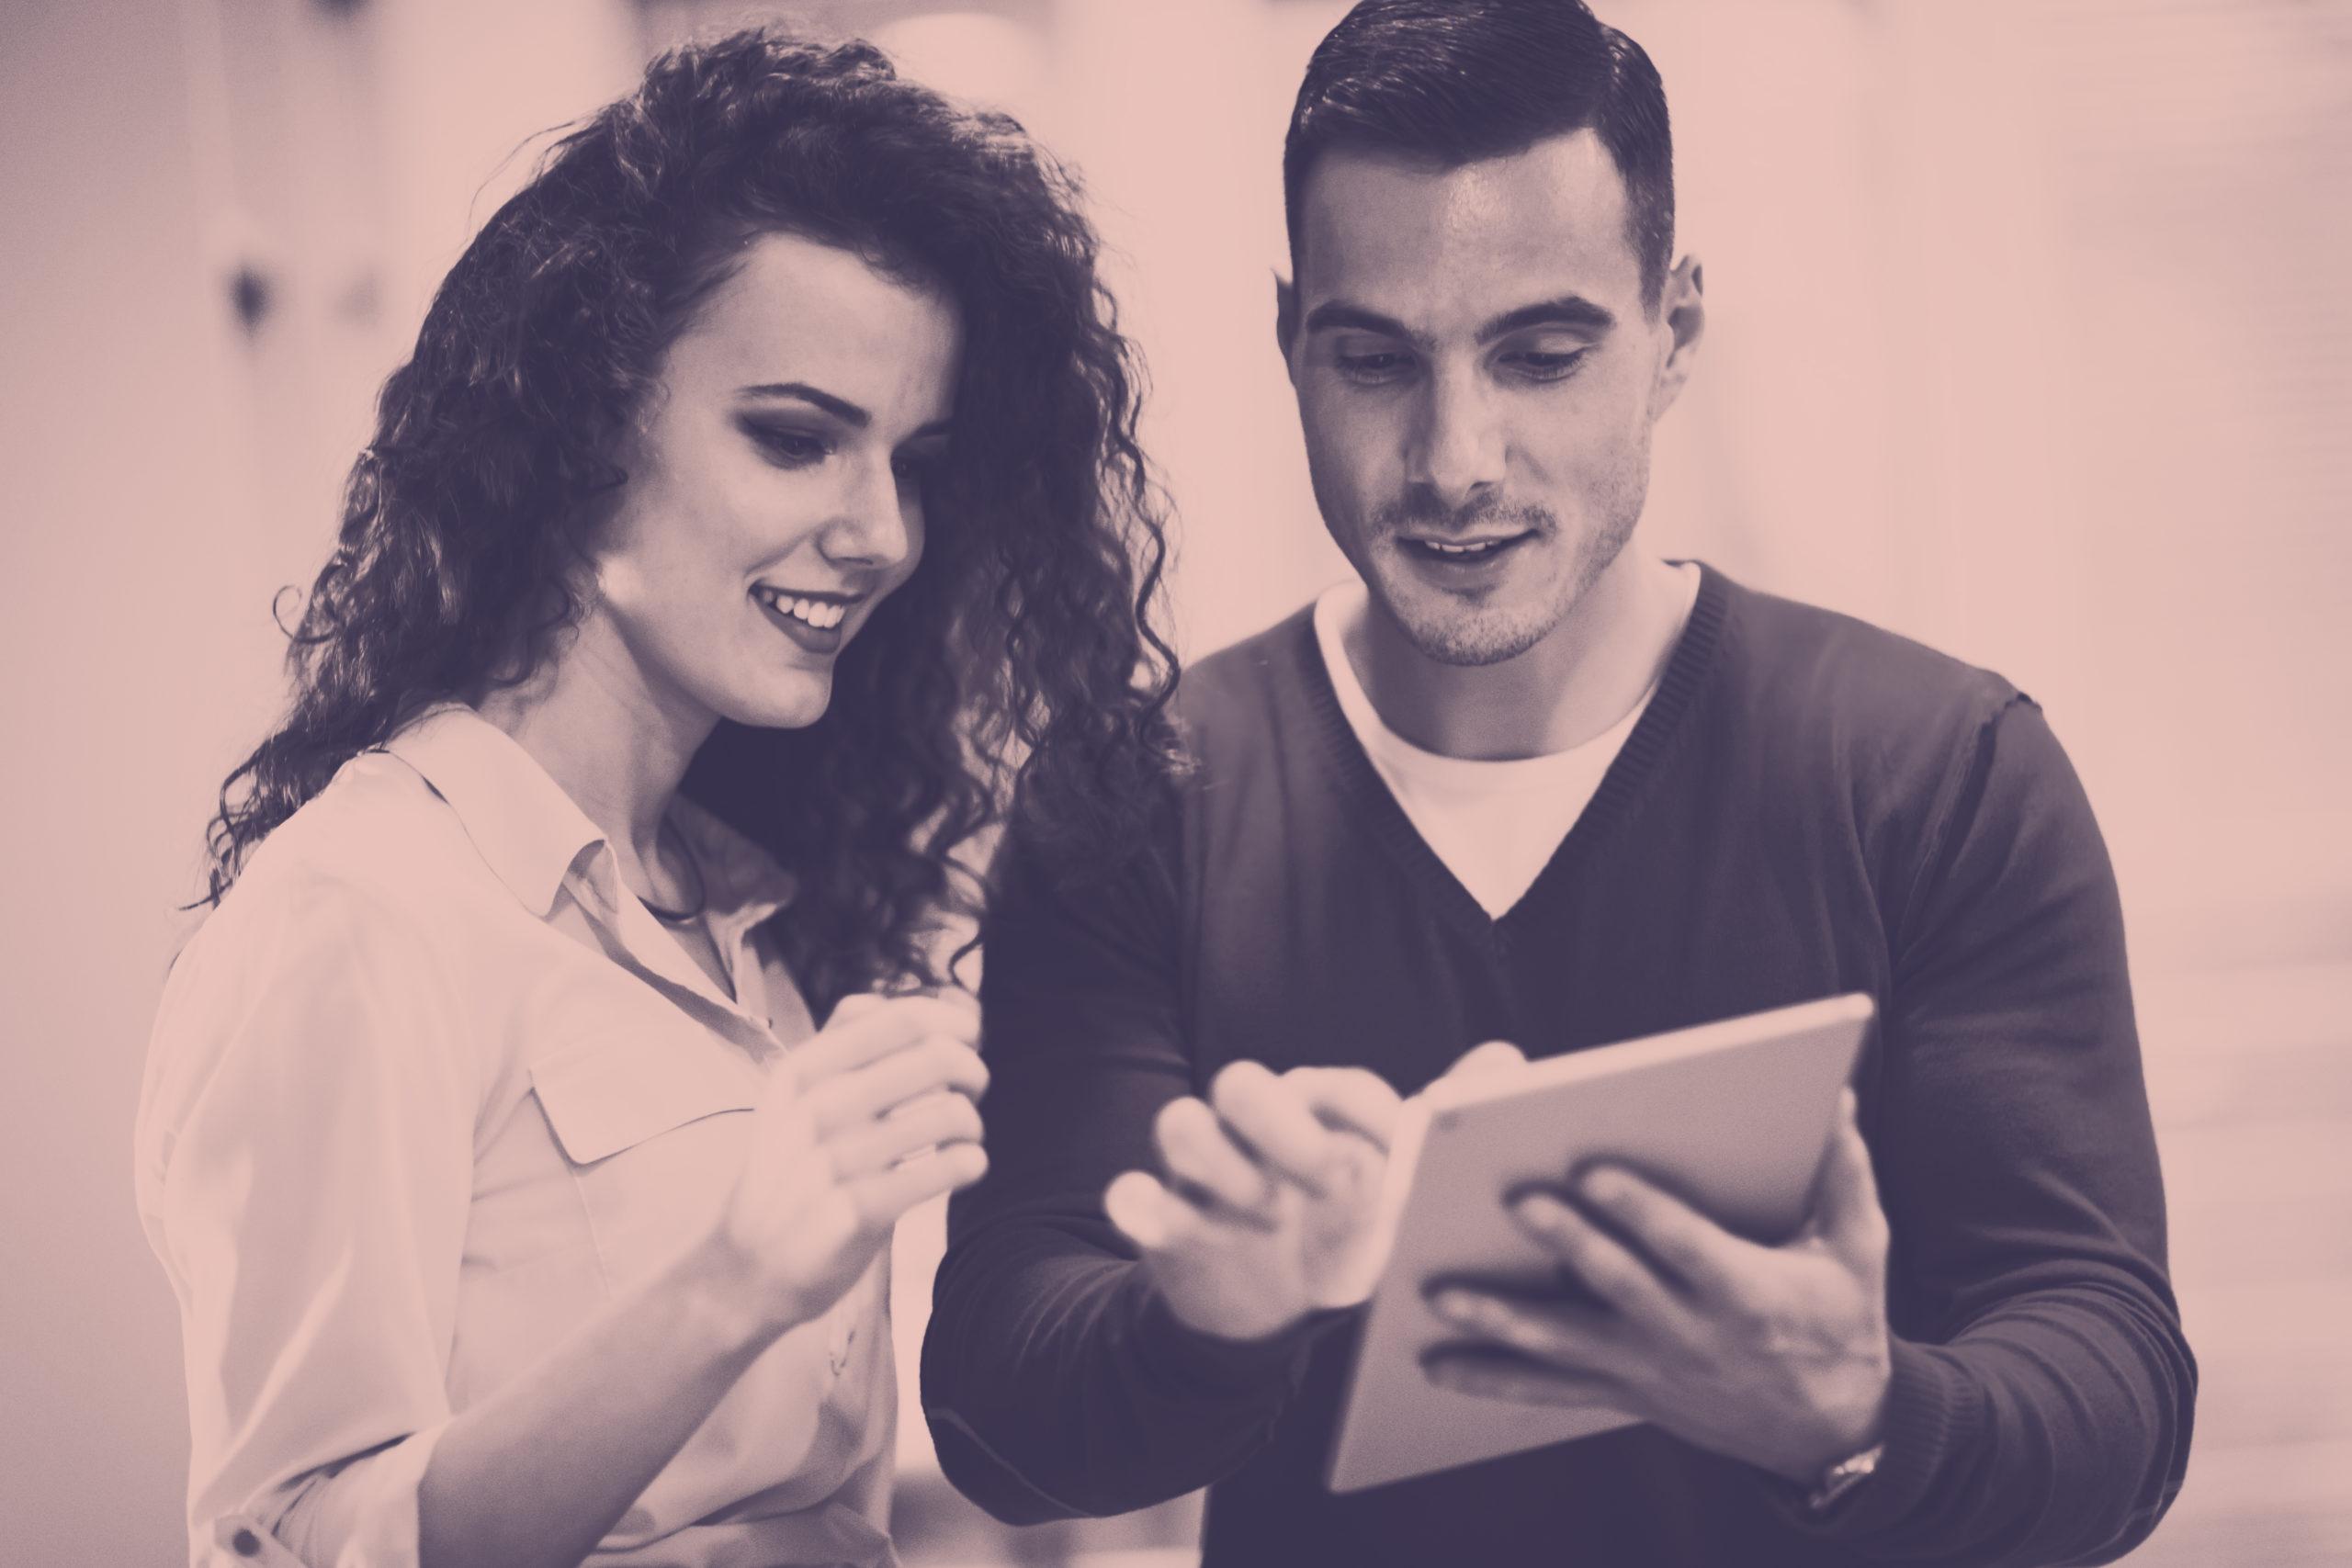 People looking at screen